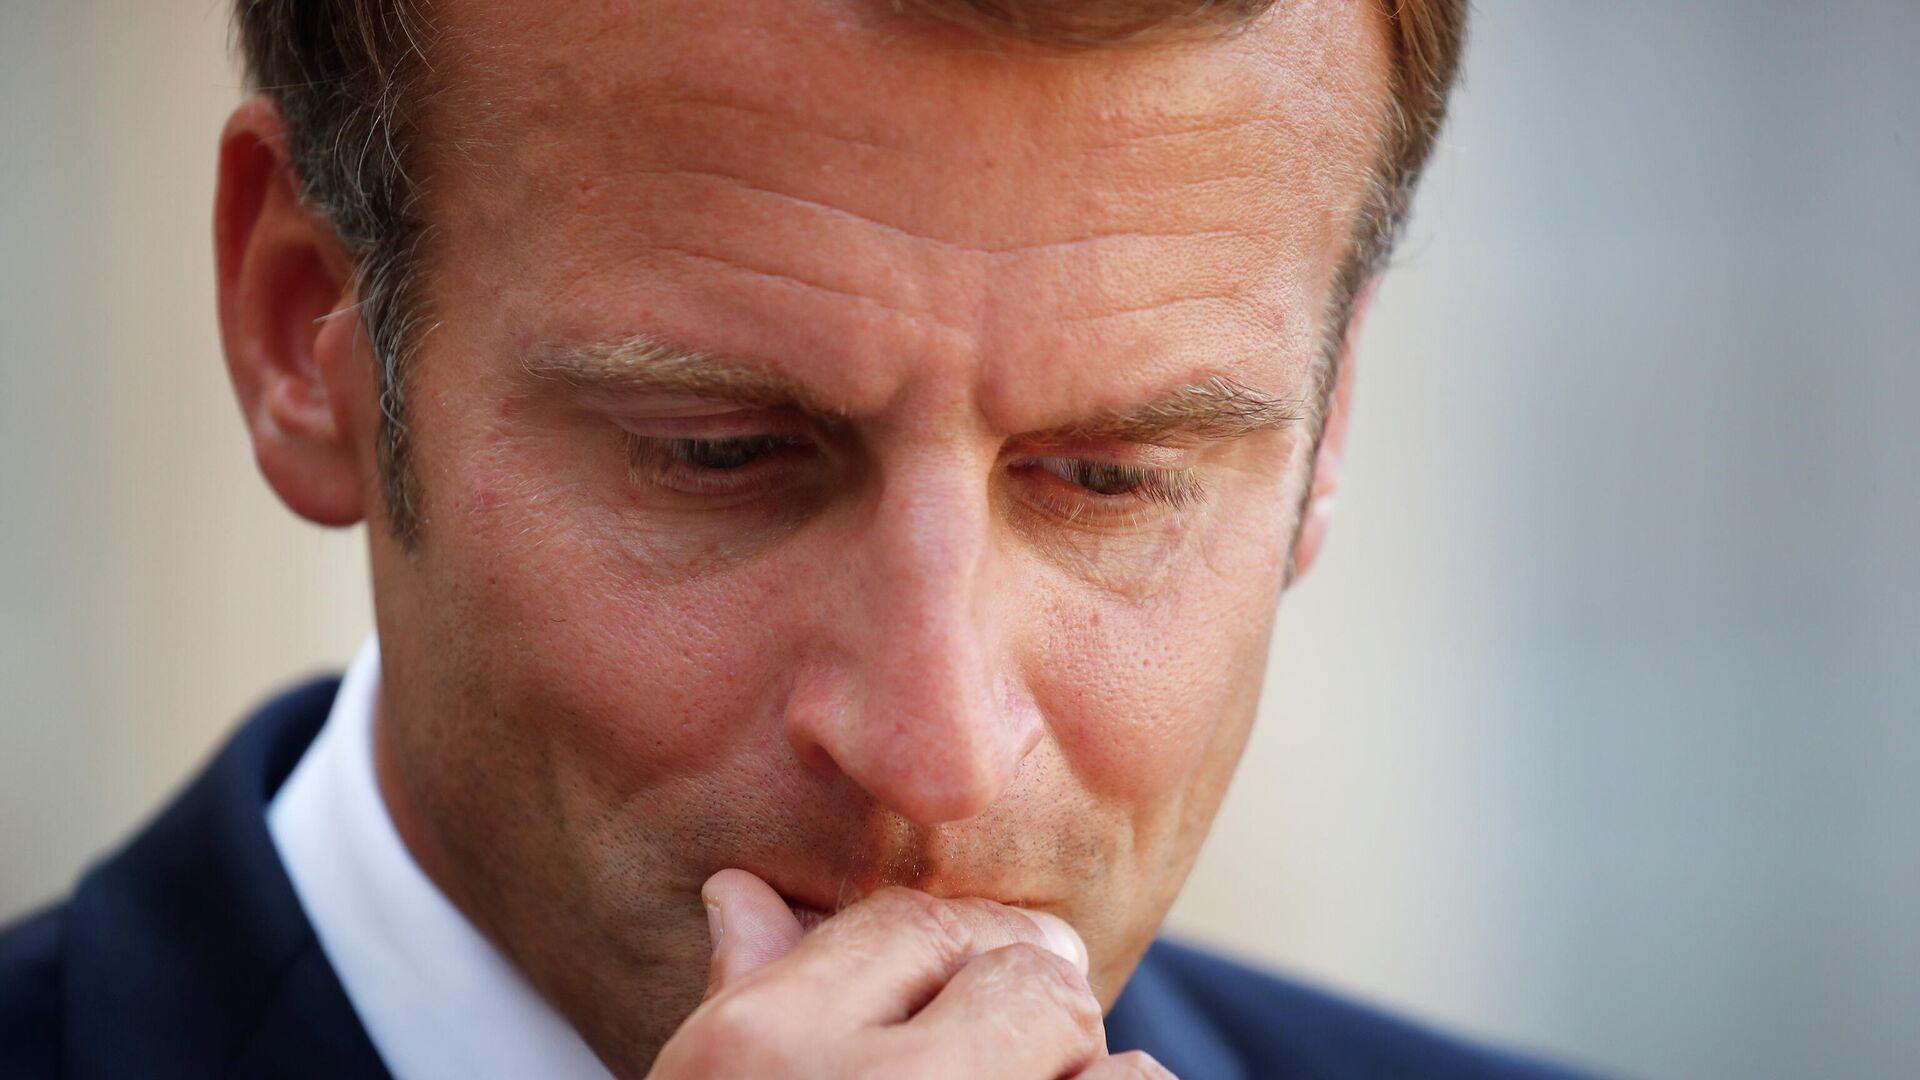 el presidente francés Emmanuel Macron - Sputnik Mundo, 1920, 13.09.2021